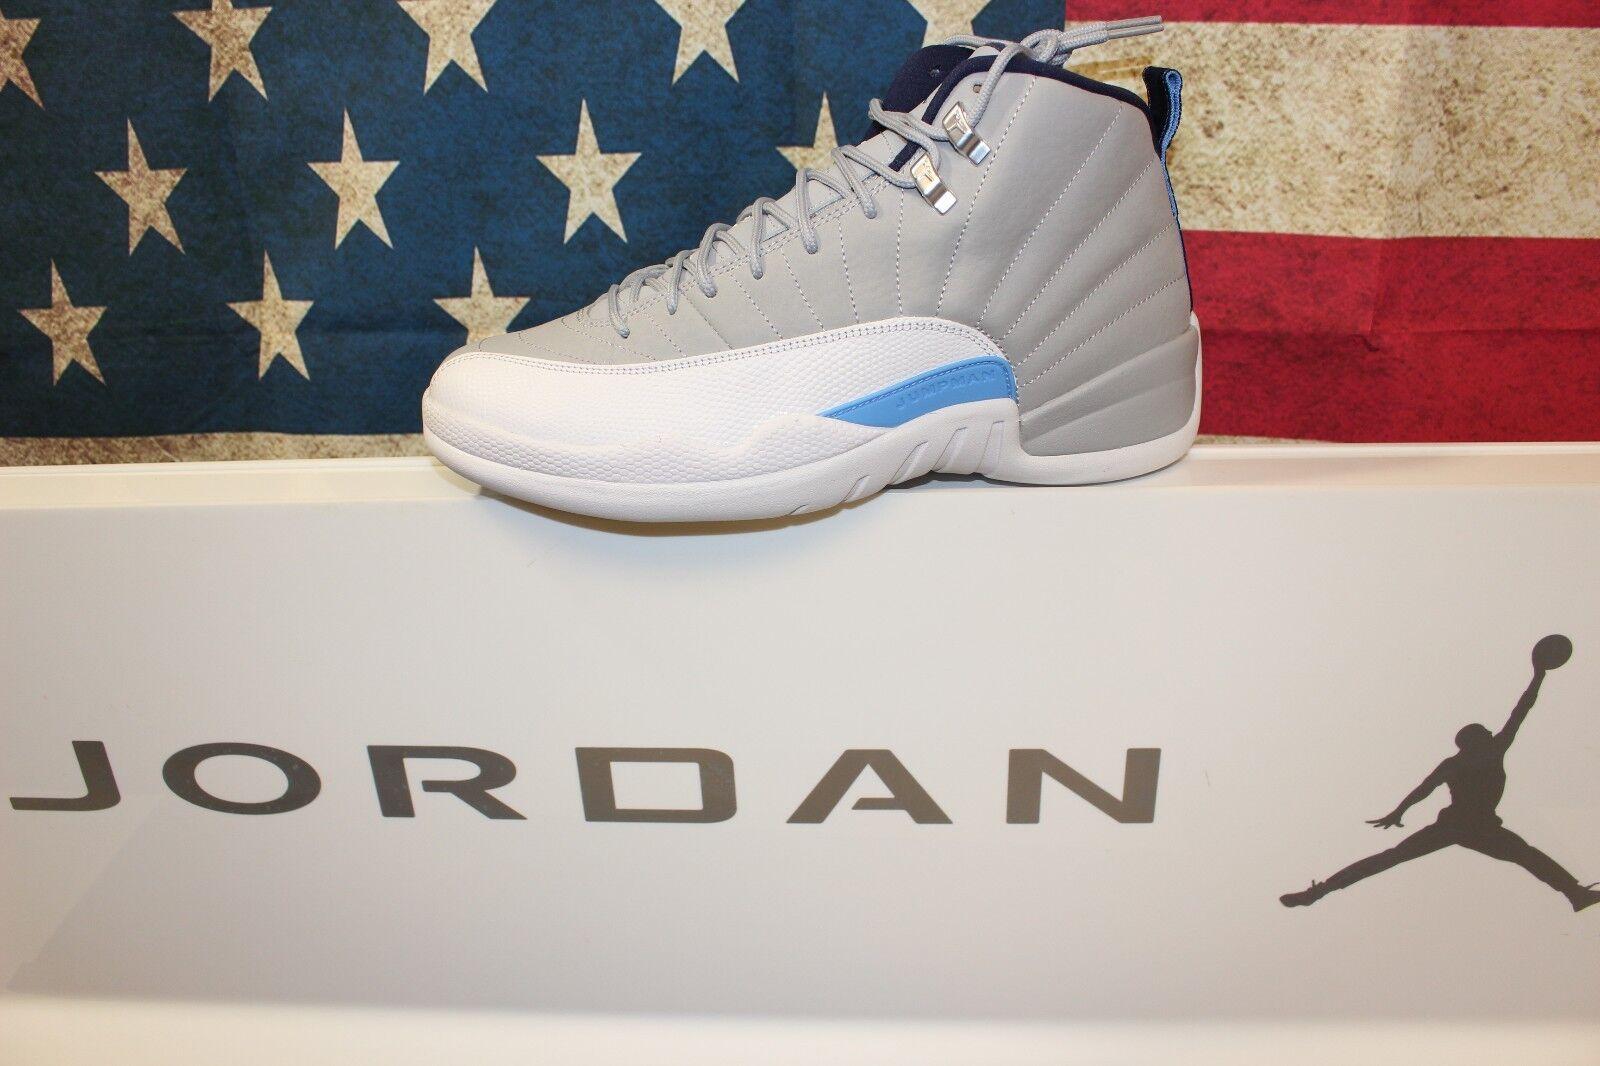 Nike jordan retro 12 università blu 130690-007 nuovo sergente dimensioni